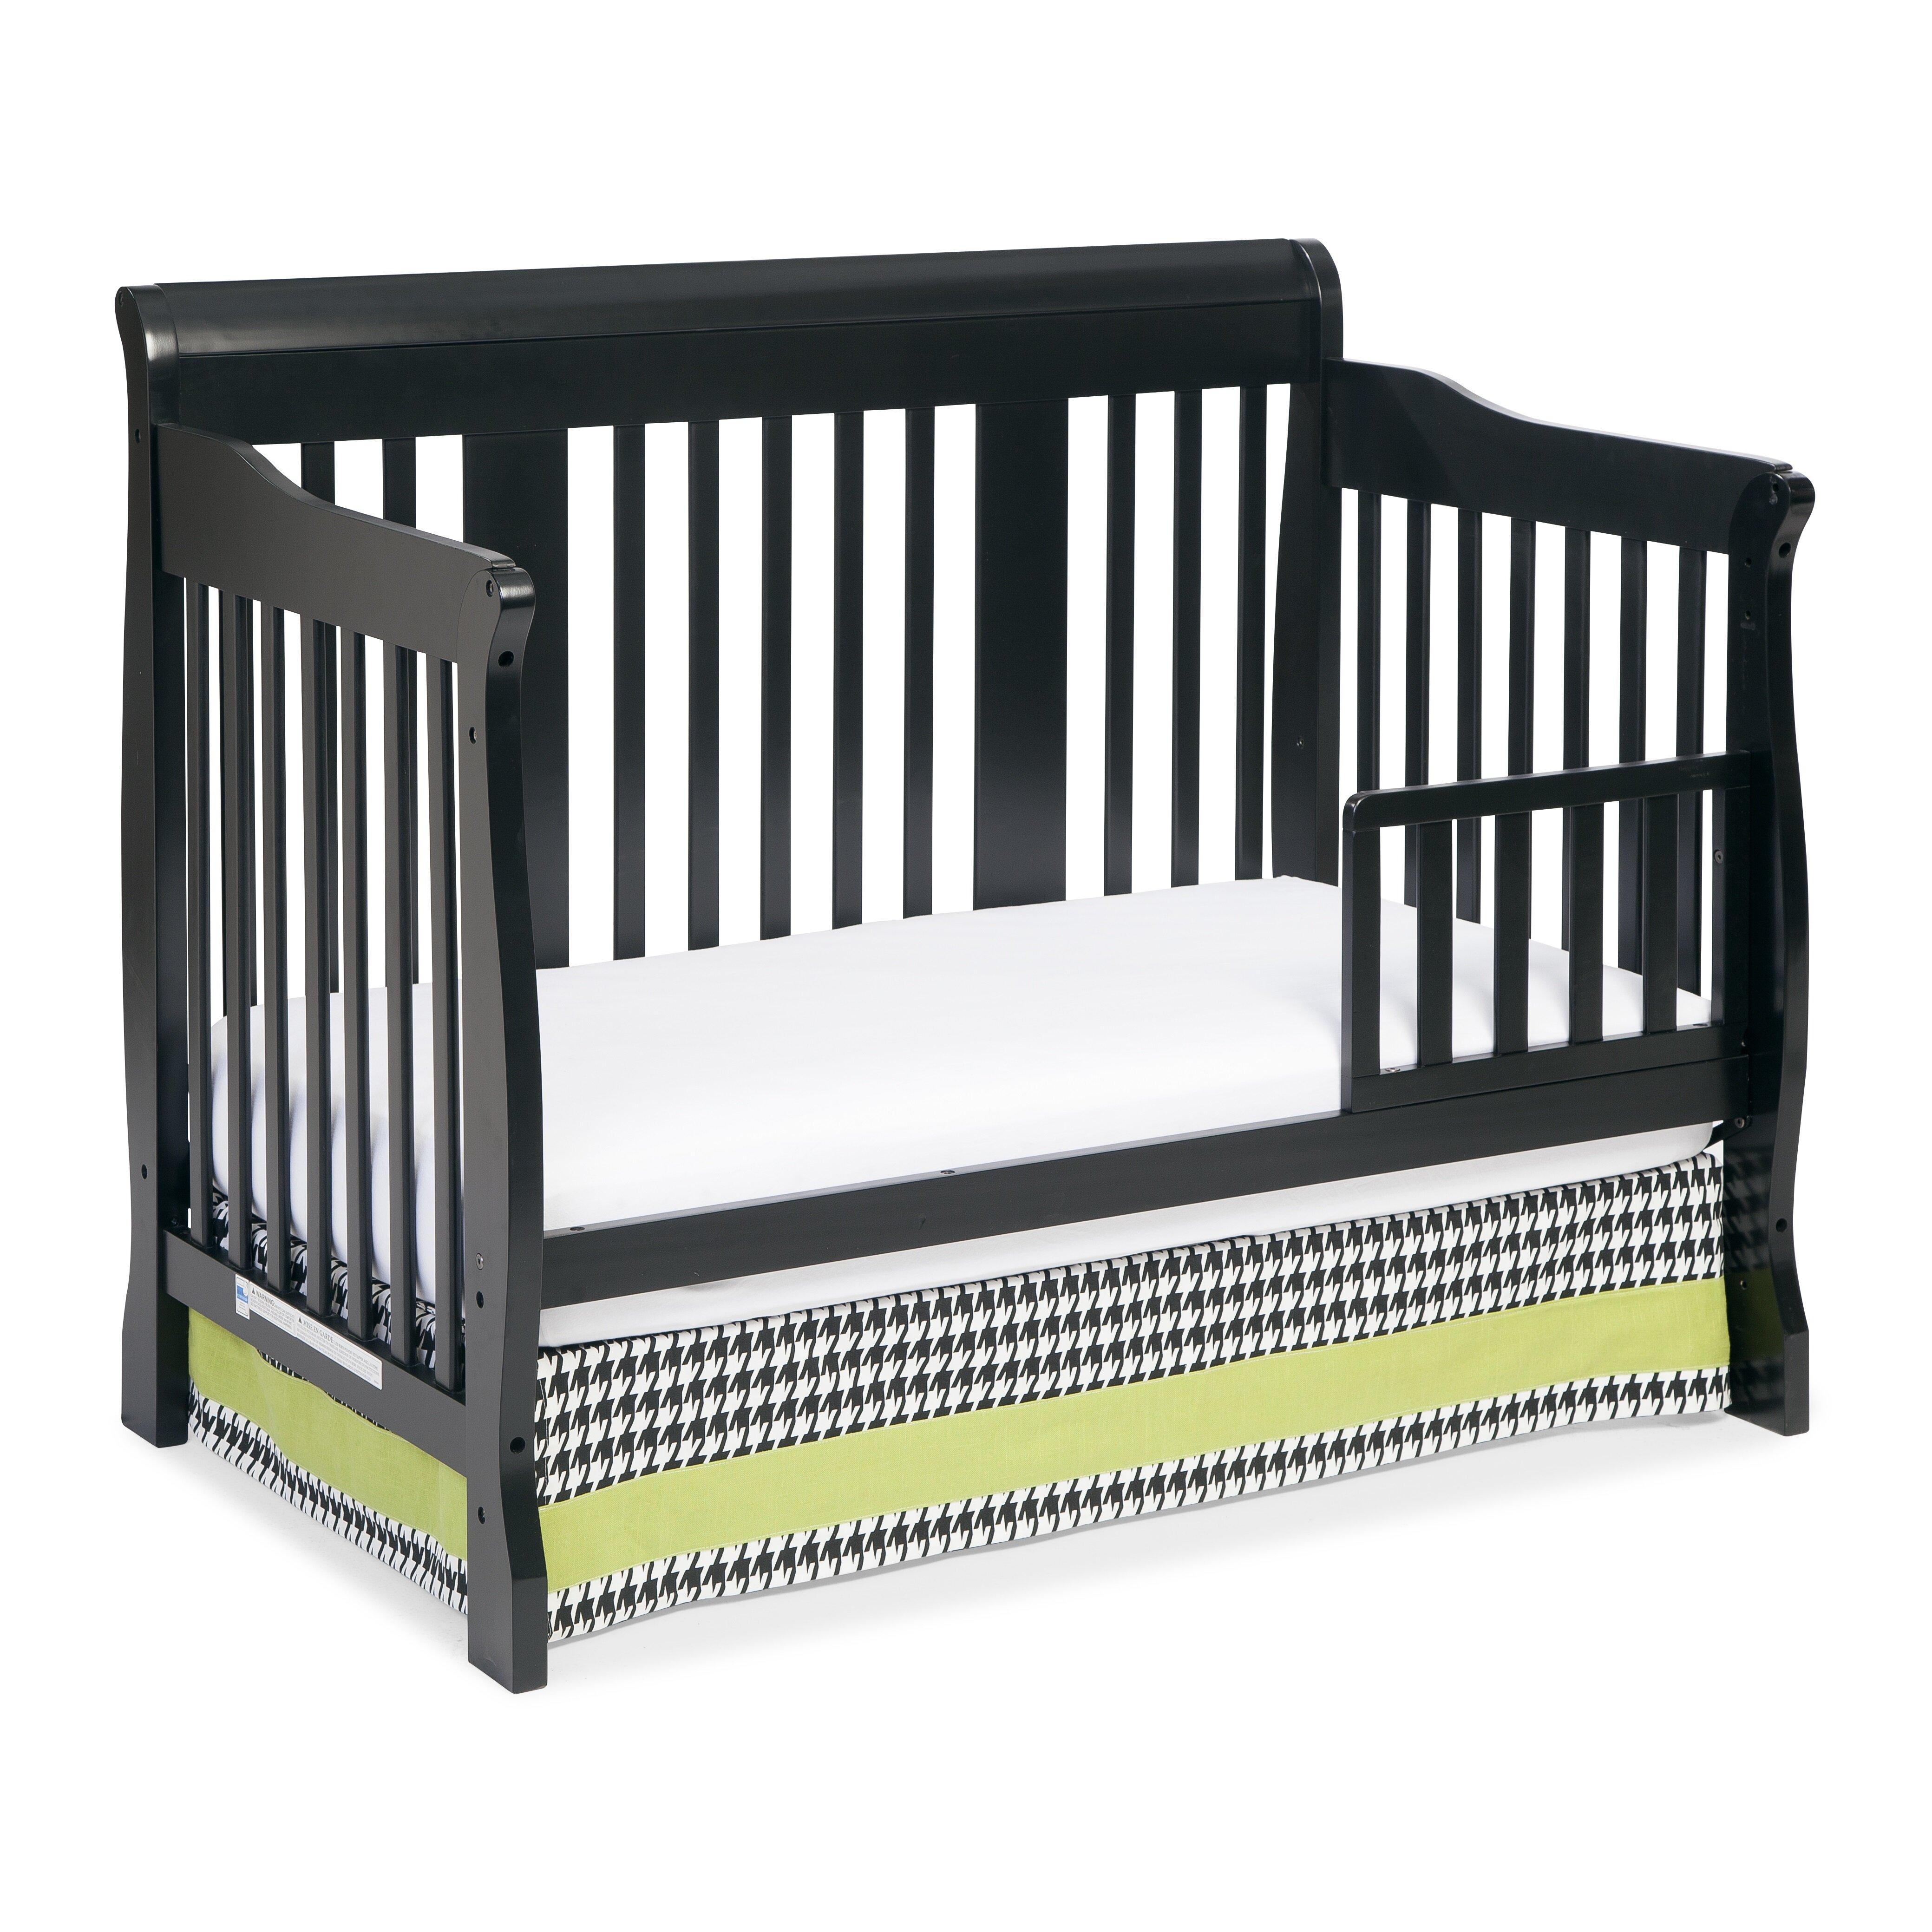 Stork craft crib reviews - Gallery Of Stork Craft Crib Reviews